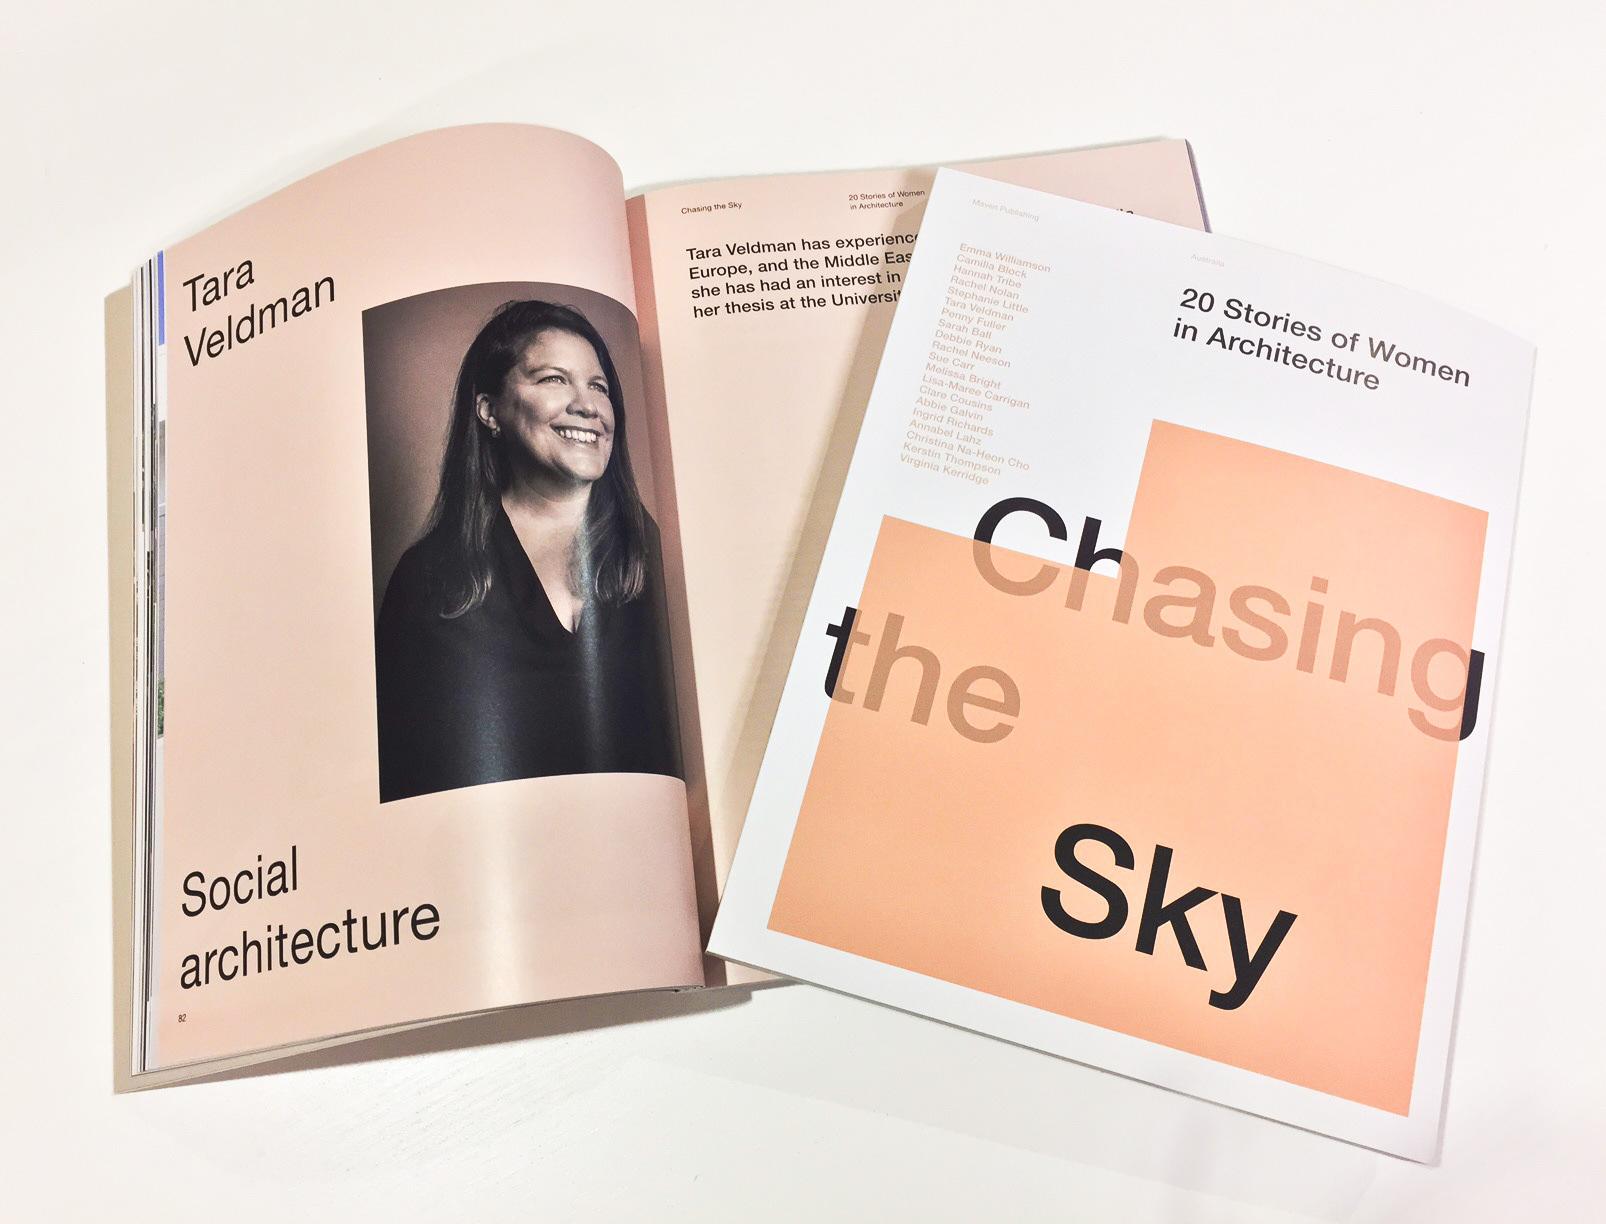 Tara Veldman Chasing the Sky Book Launch BLP